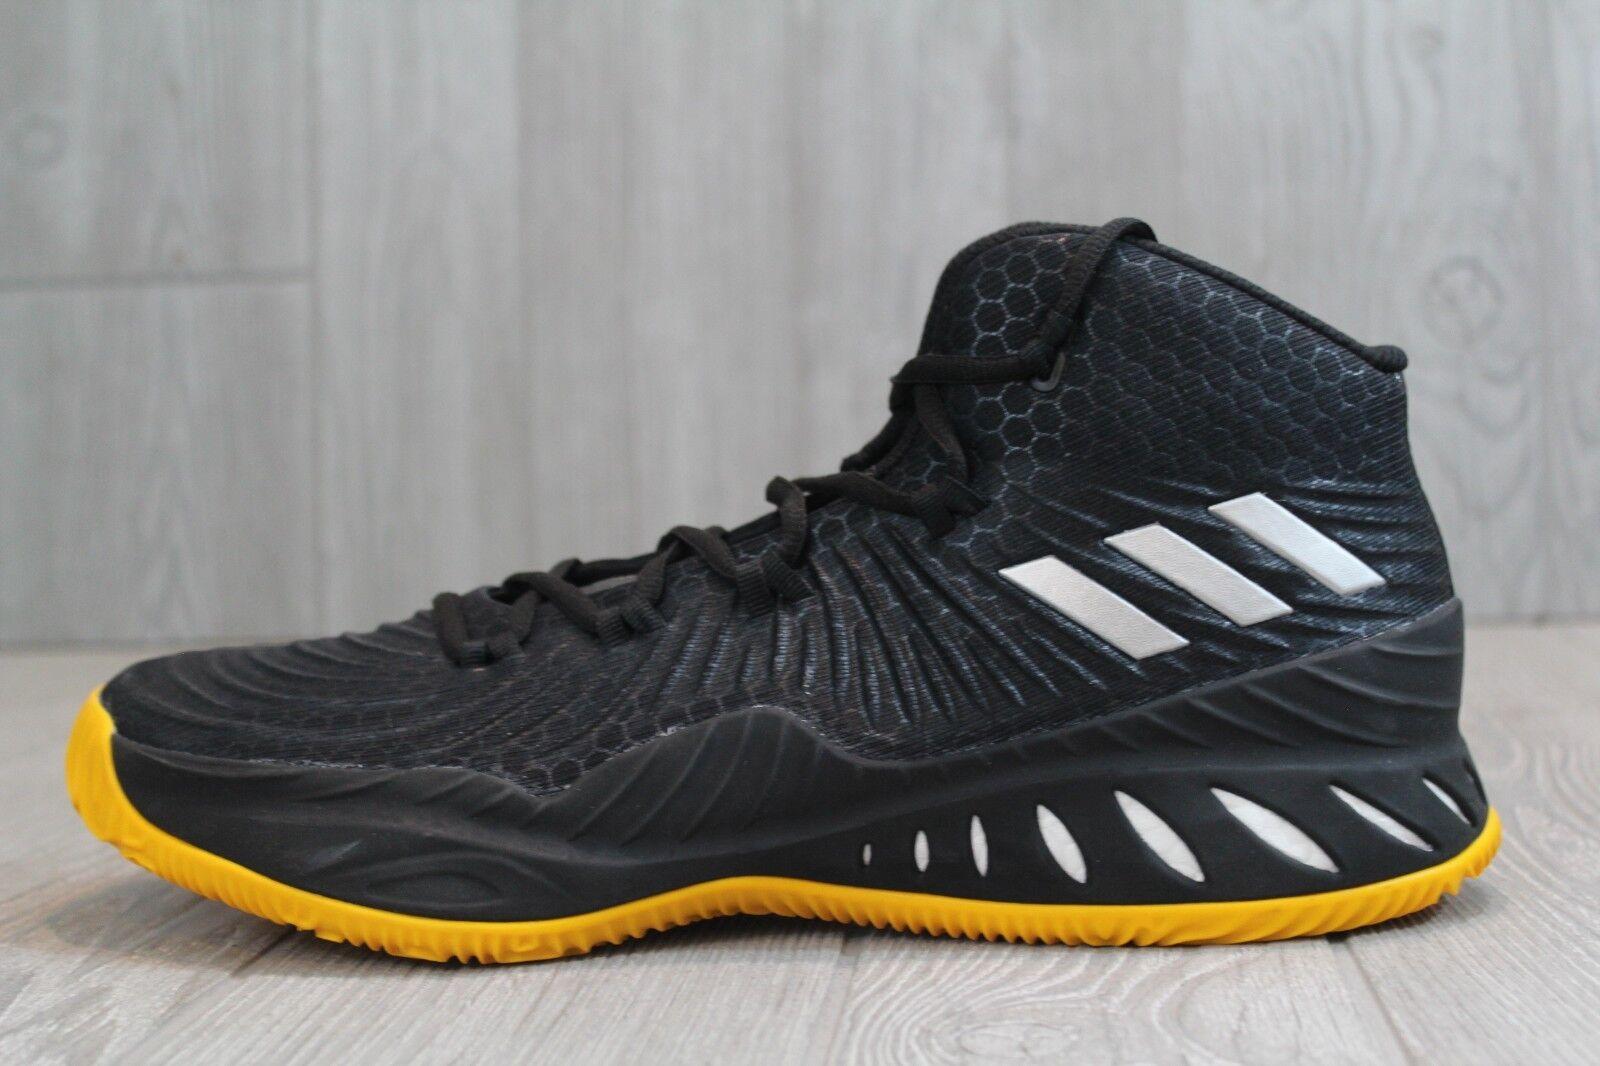 32 Adidas Crazy Explosive 2017 Basketball shoes Black Yellow Size 12.5, 13